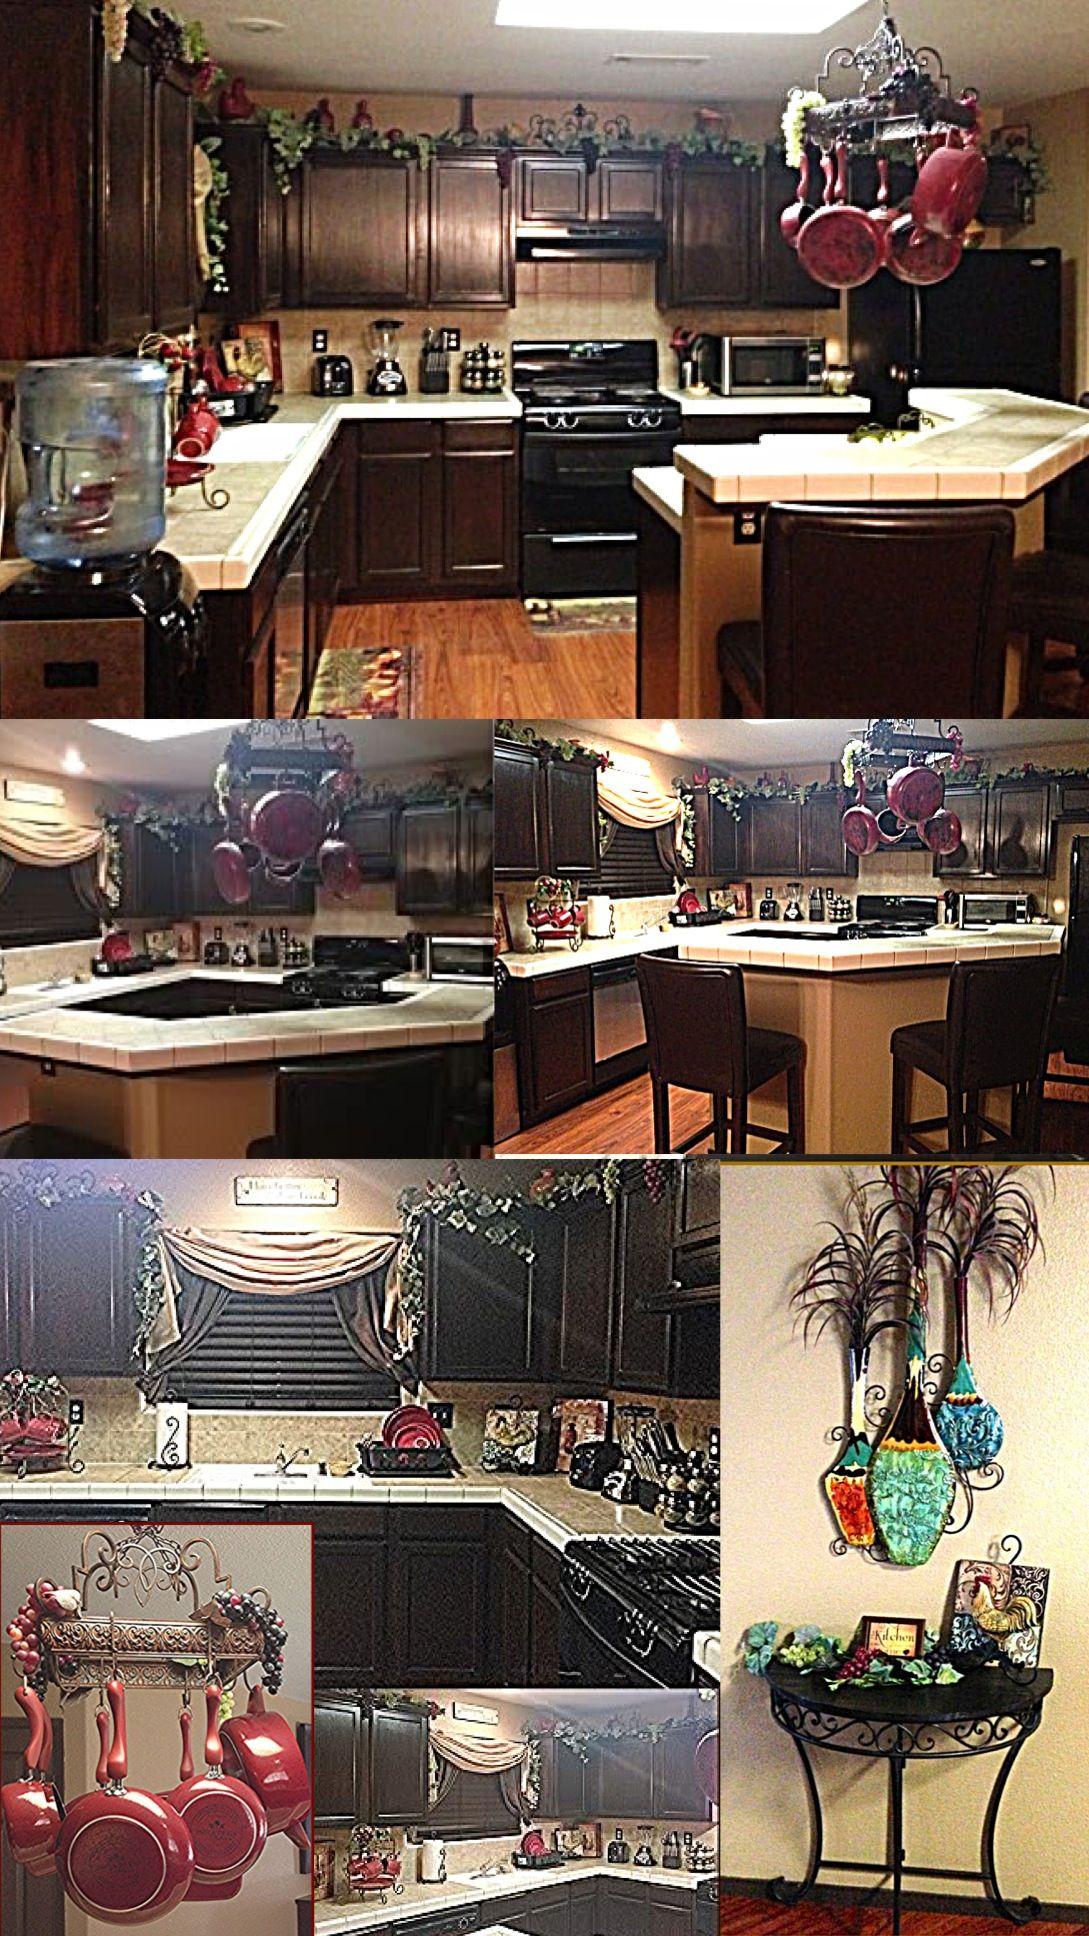 DIY Espresso Gel Stained Cabinets DIY! Kitchen ideas over ...